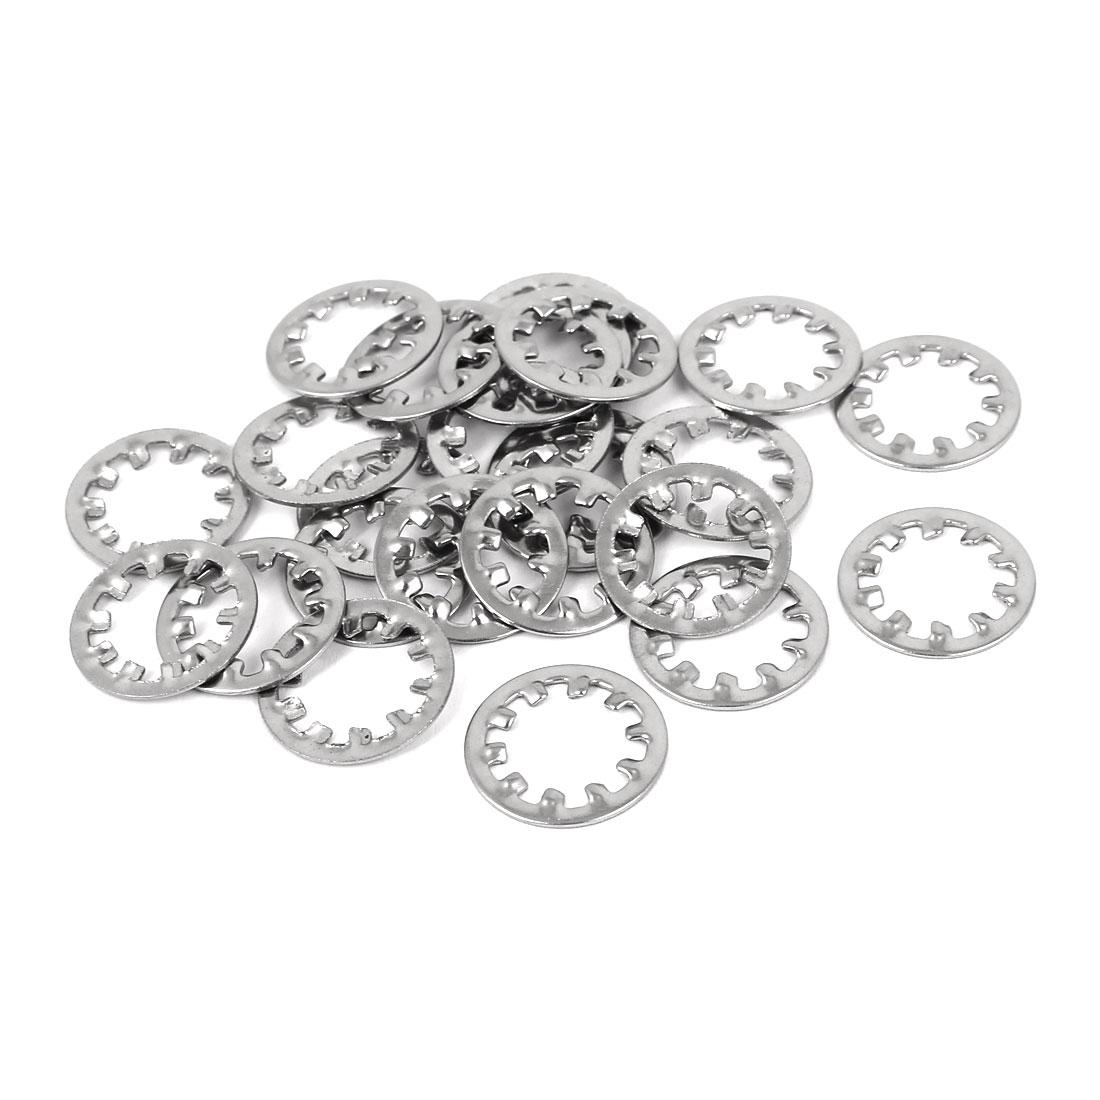 M10 304 Stainless Steel Internal Star Lock Washers 25 Pcs